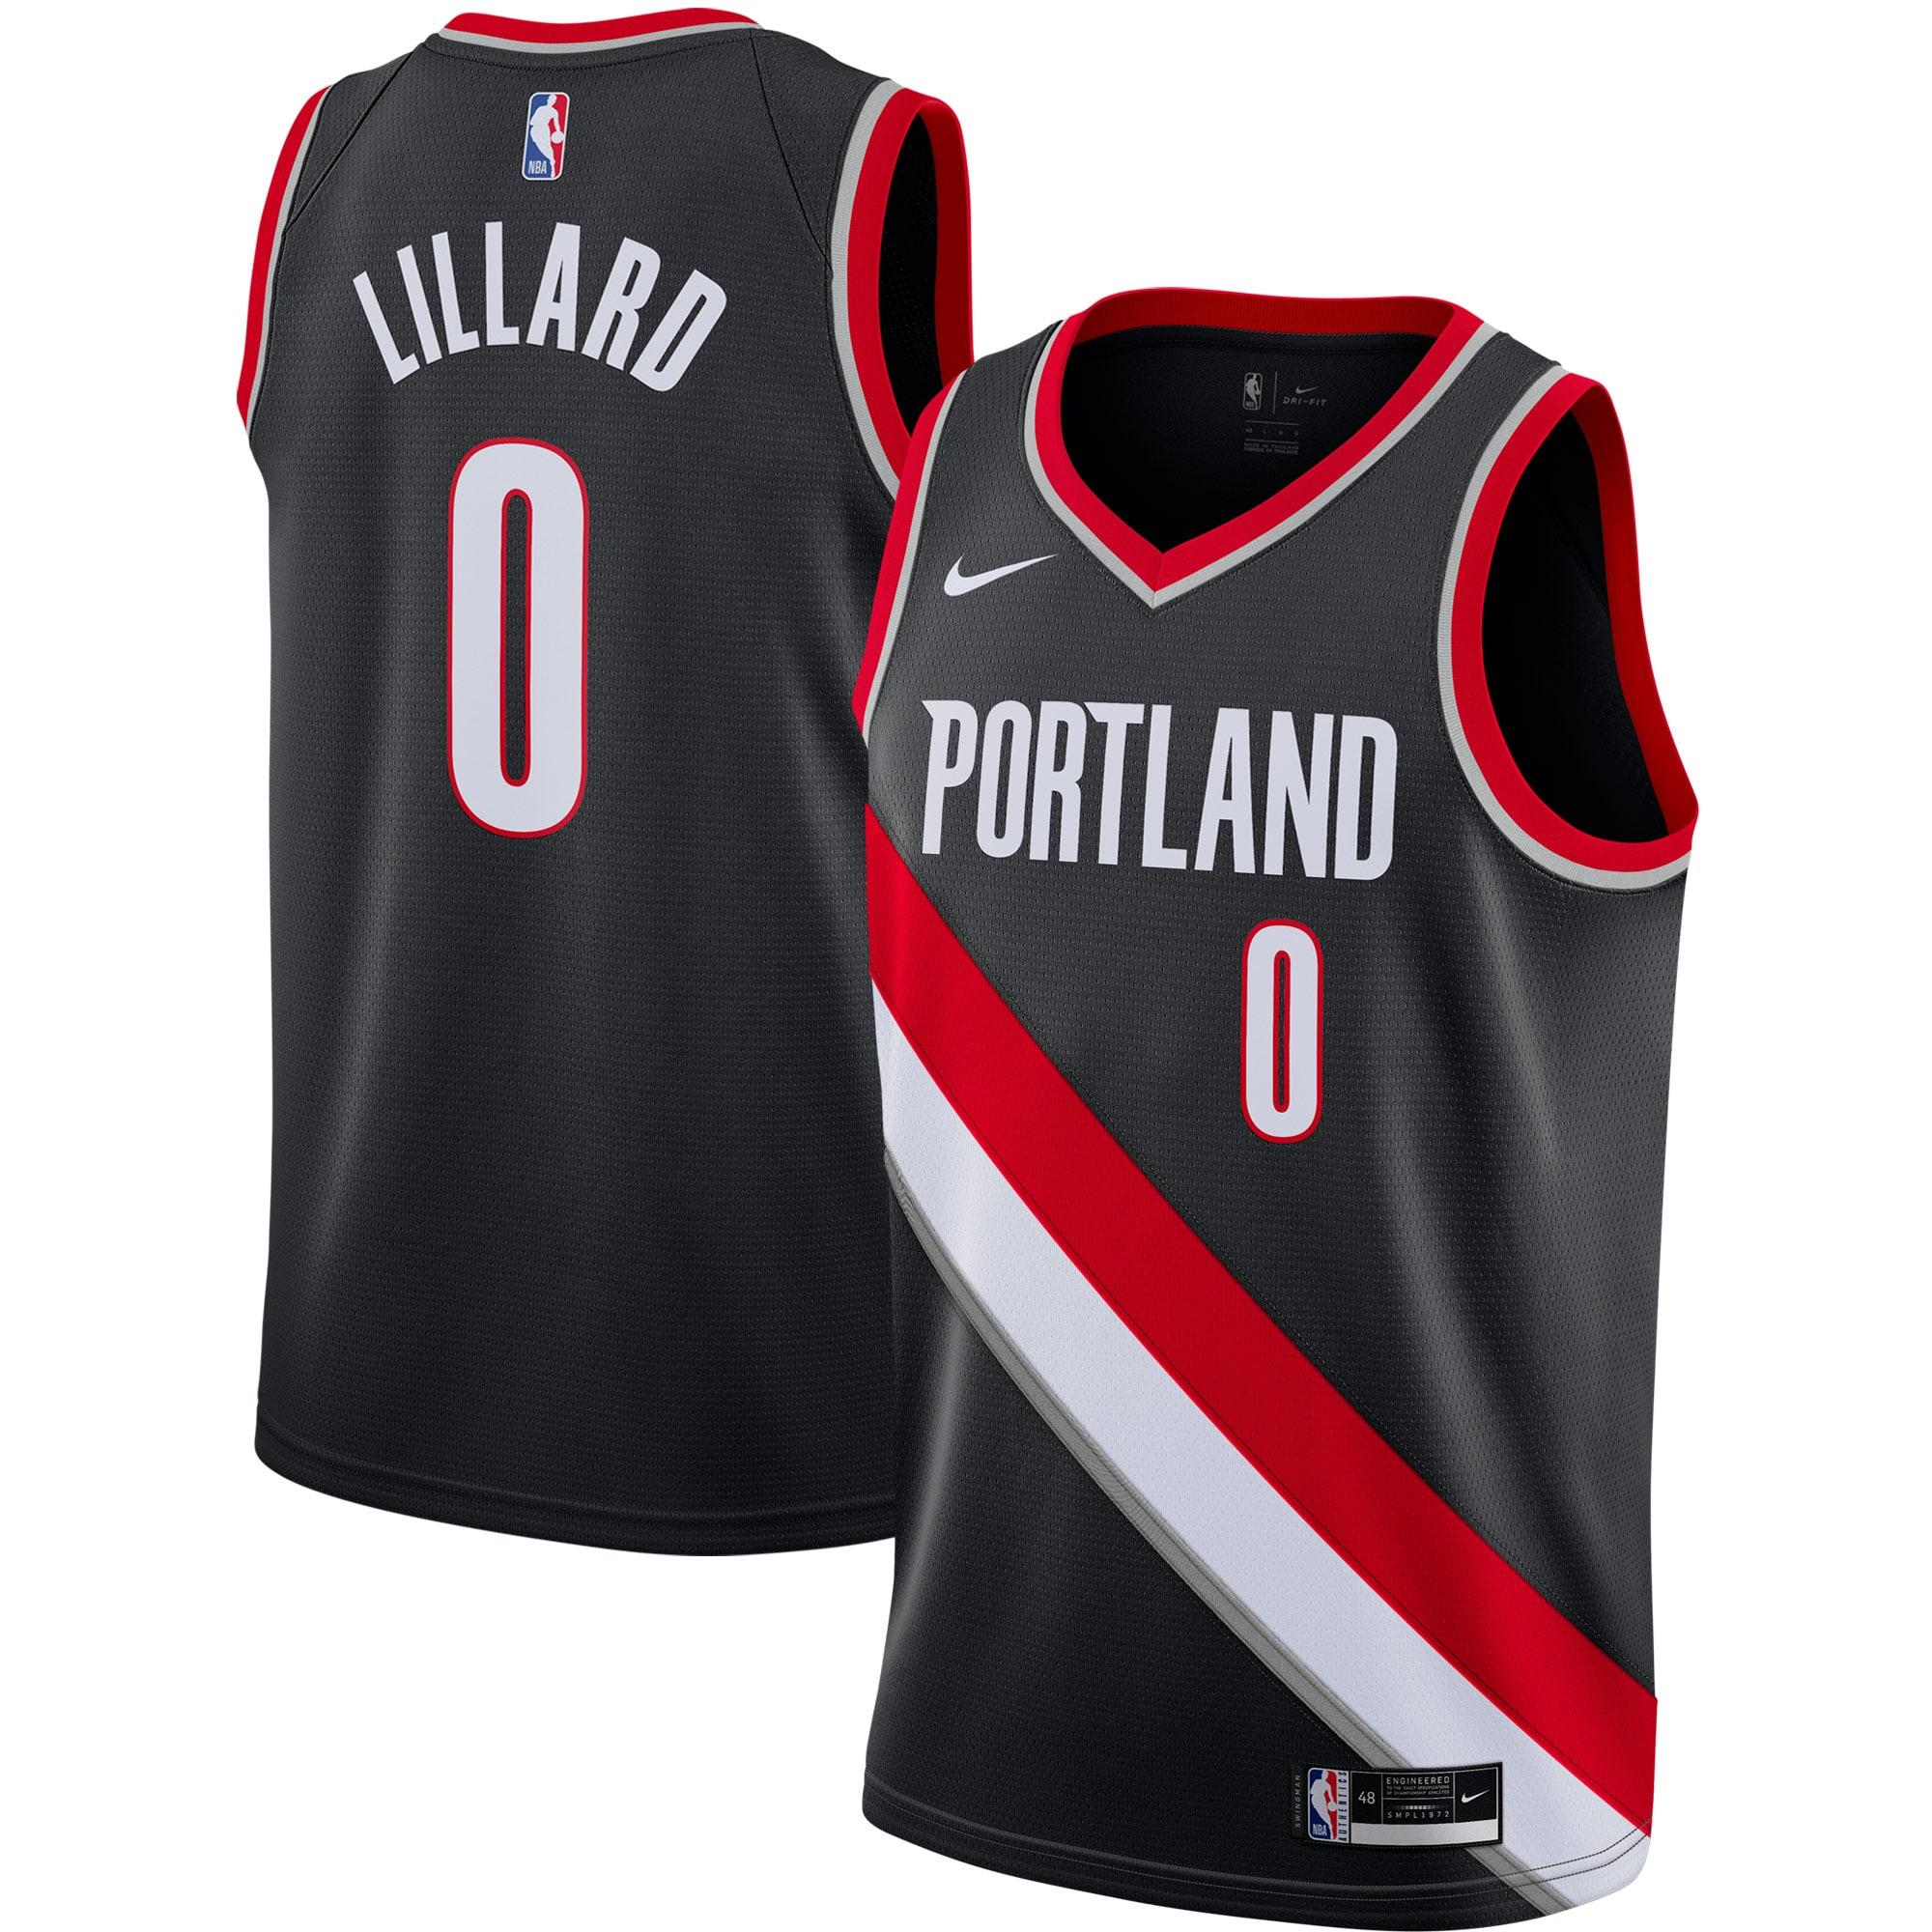 Damian Lillard Portland Trail Blazers Nike 2020/21 Swingman Jersey Black - Icon Edition